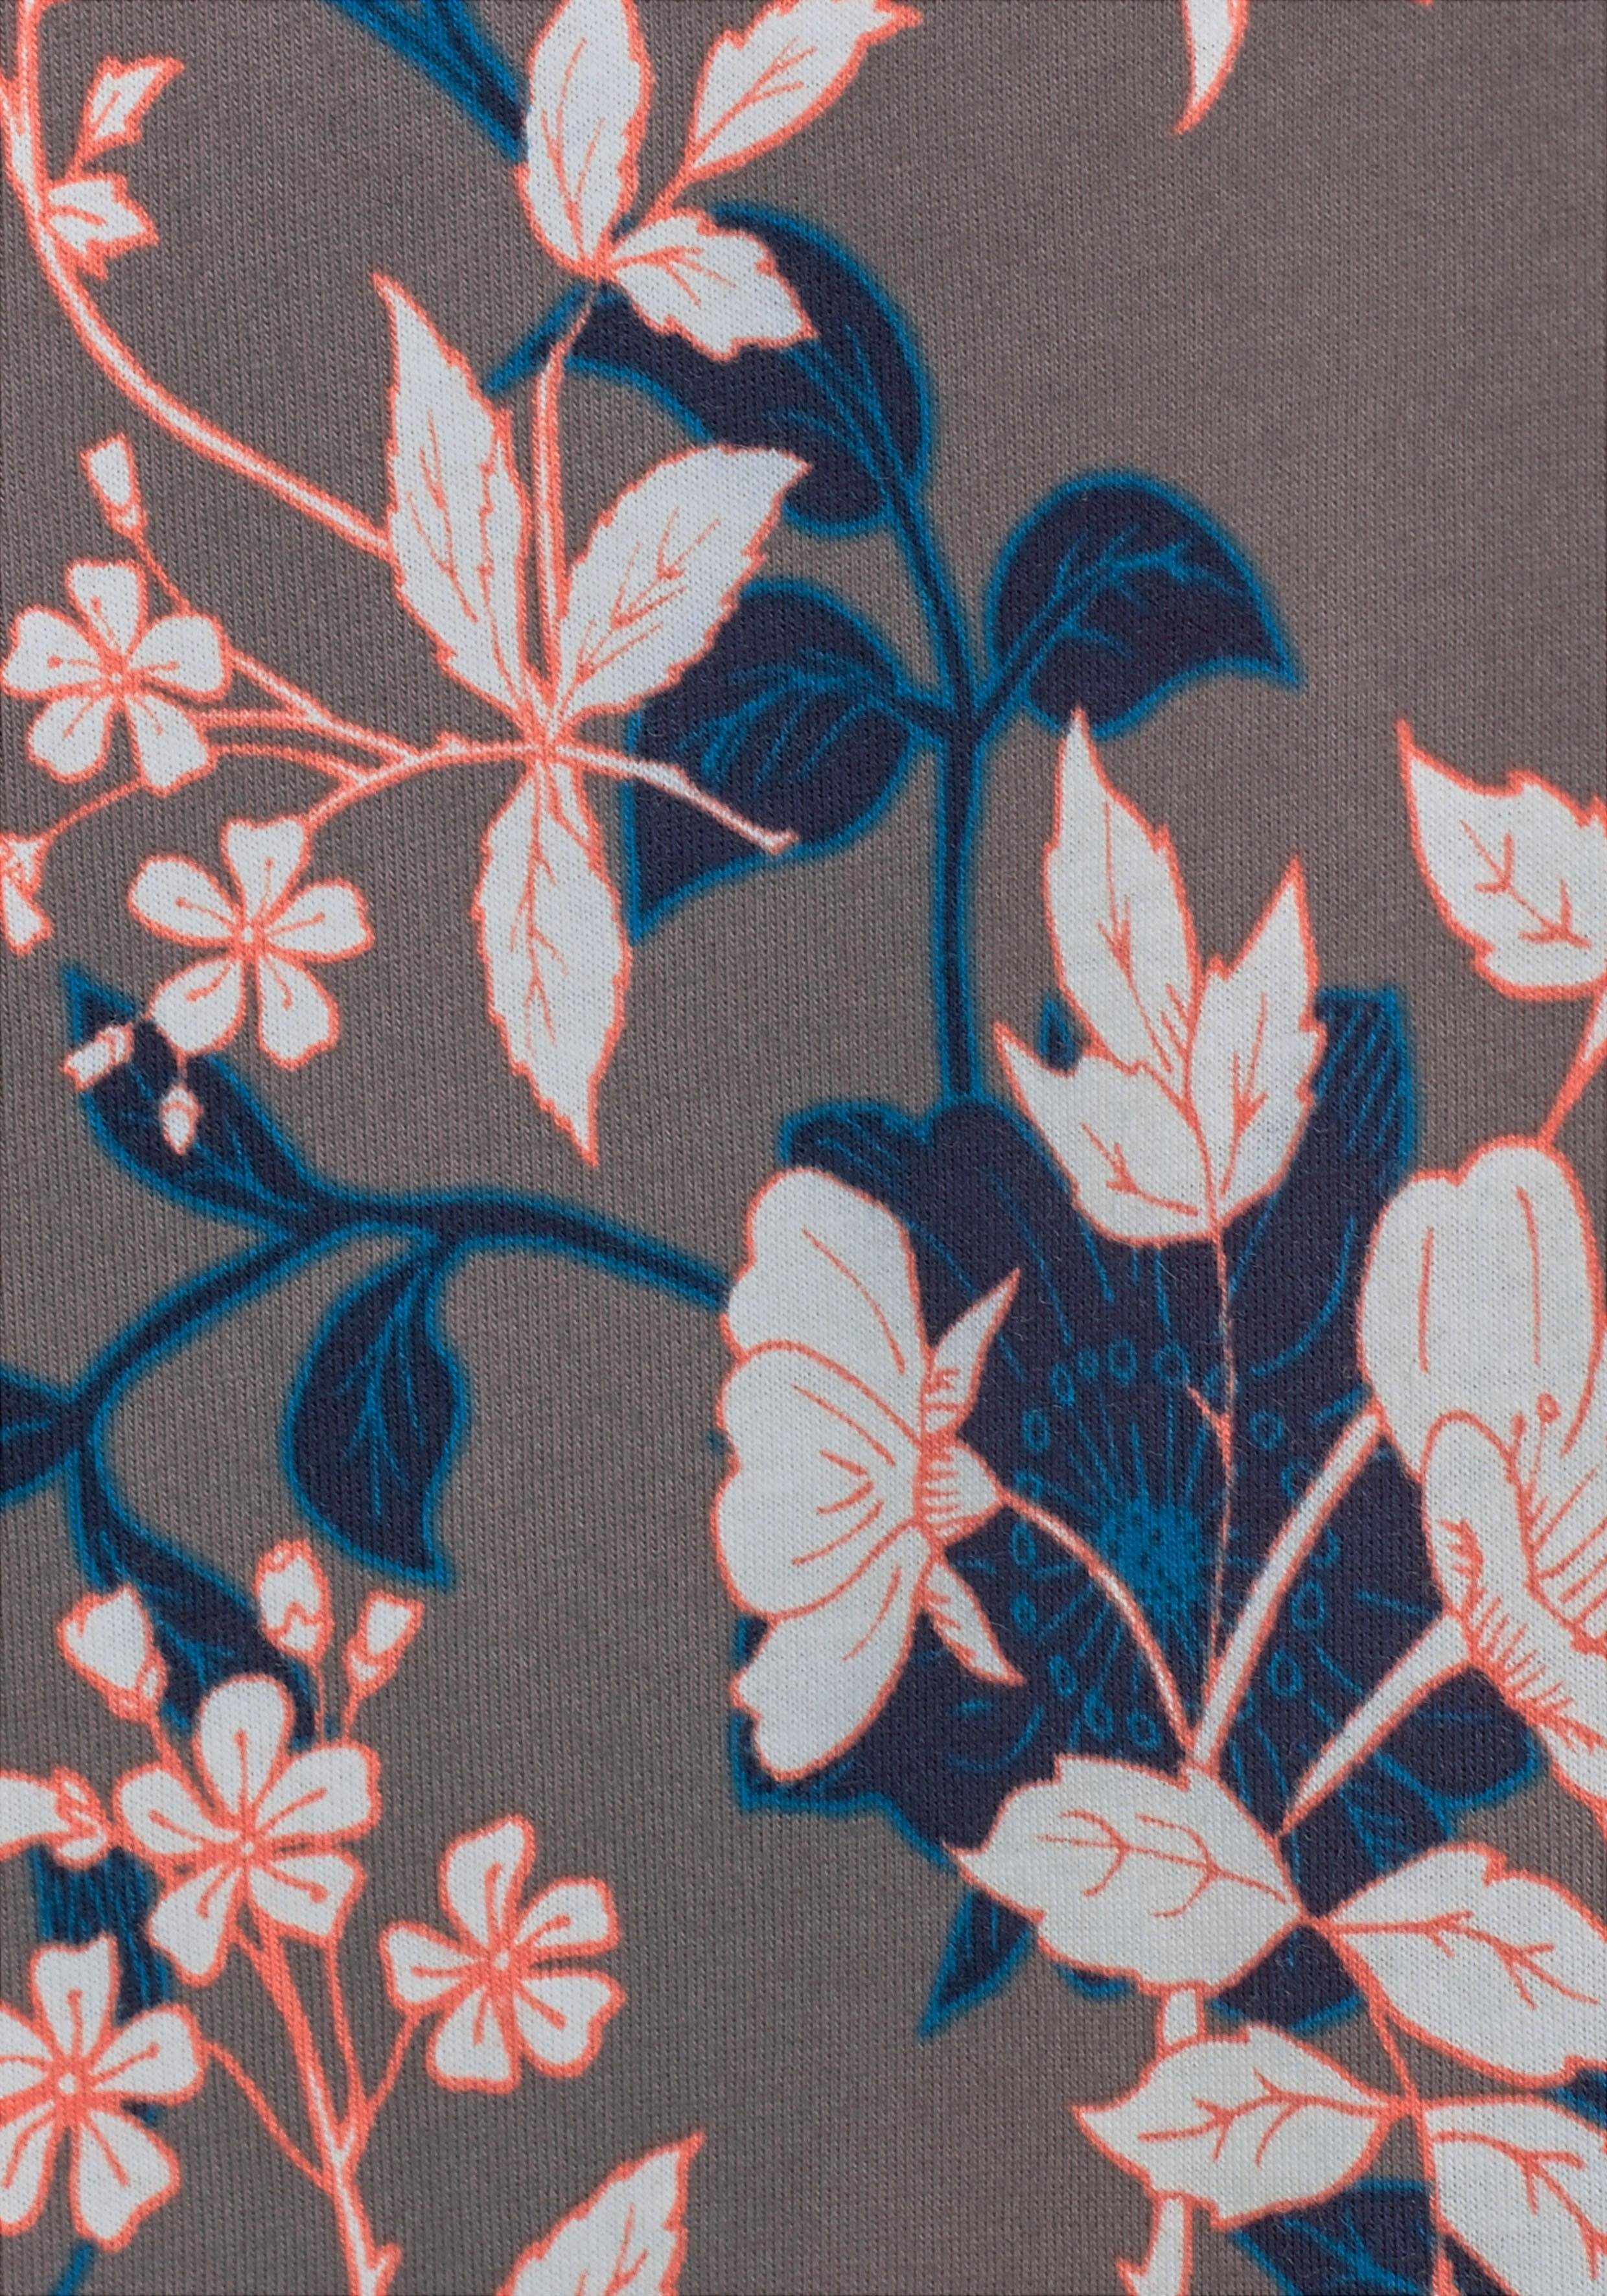 S oliver Blumenprint Red Label Kimono Mit Bodywear 6UqBg